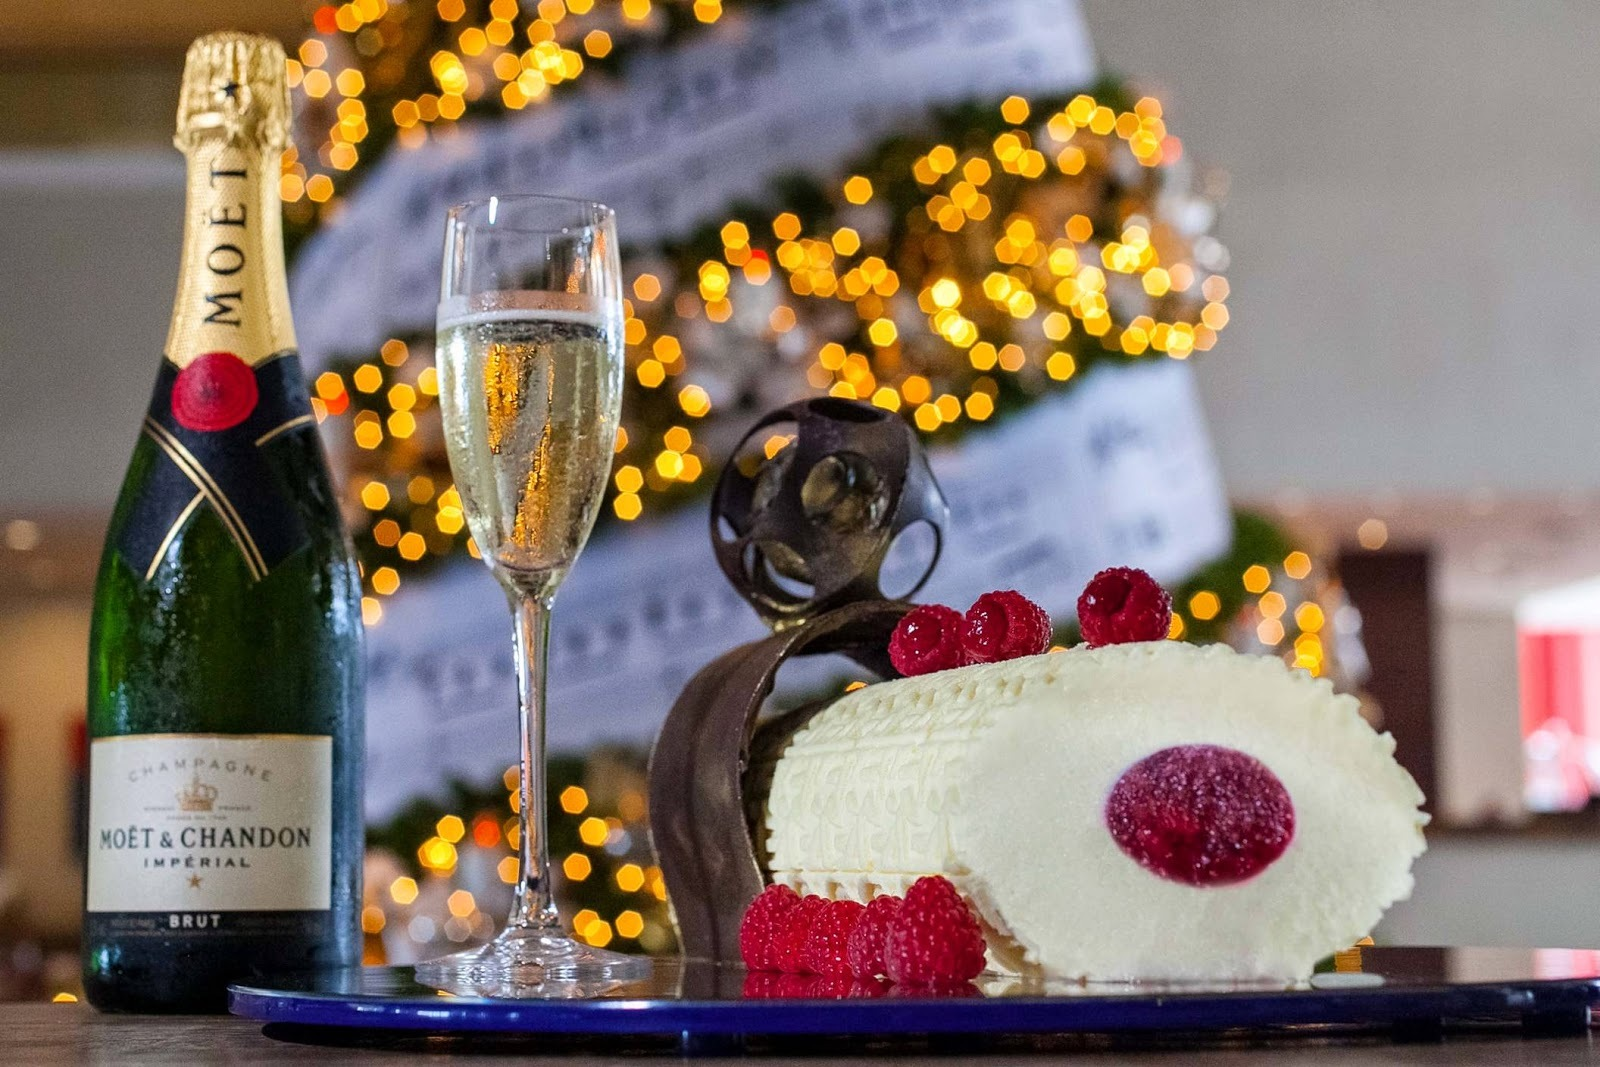 Chef francês cria Bûche de Noel com champanhe Moët & Chandon